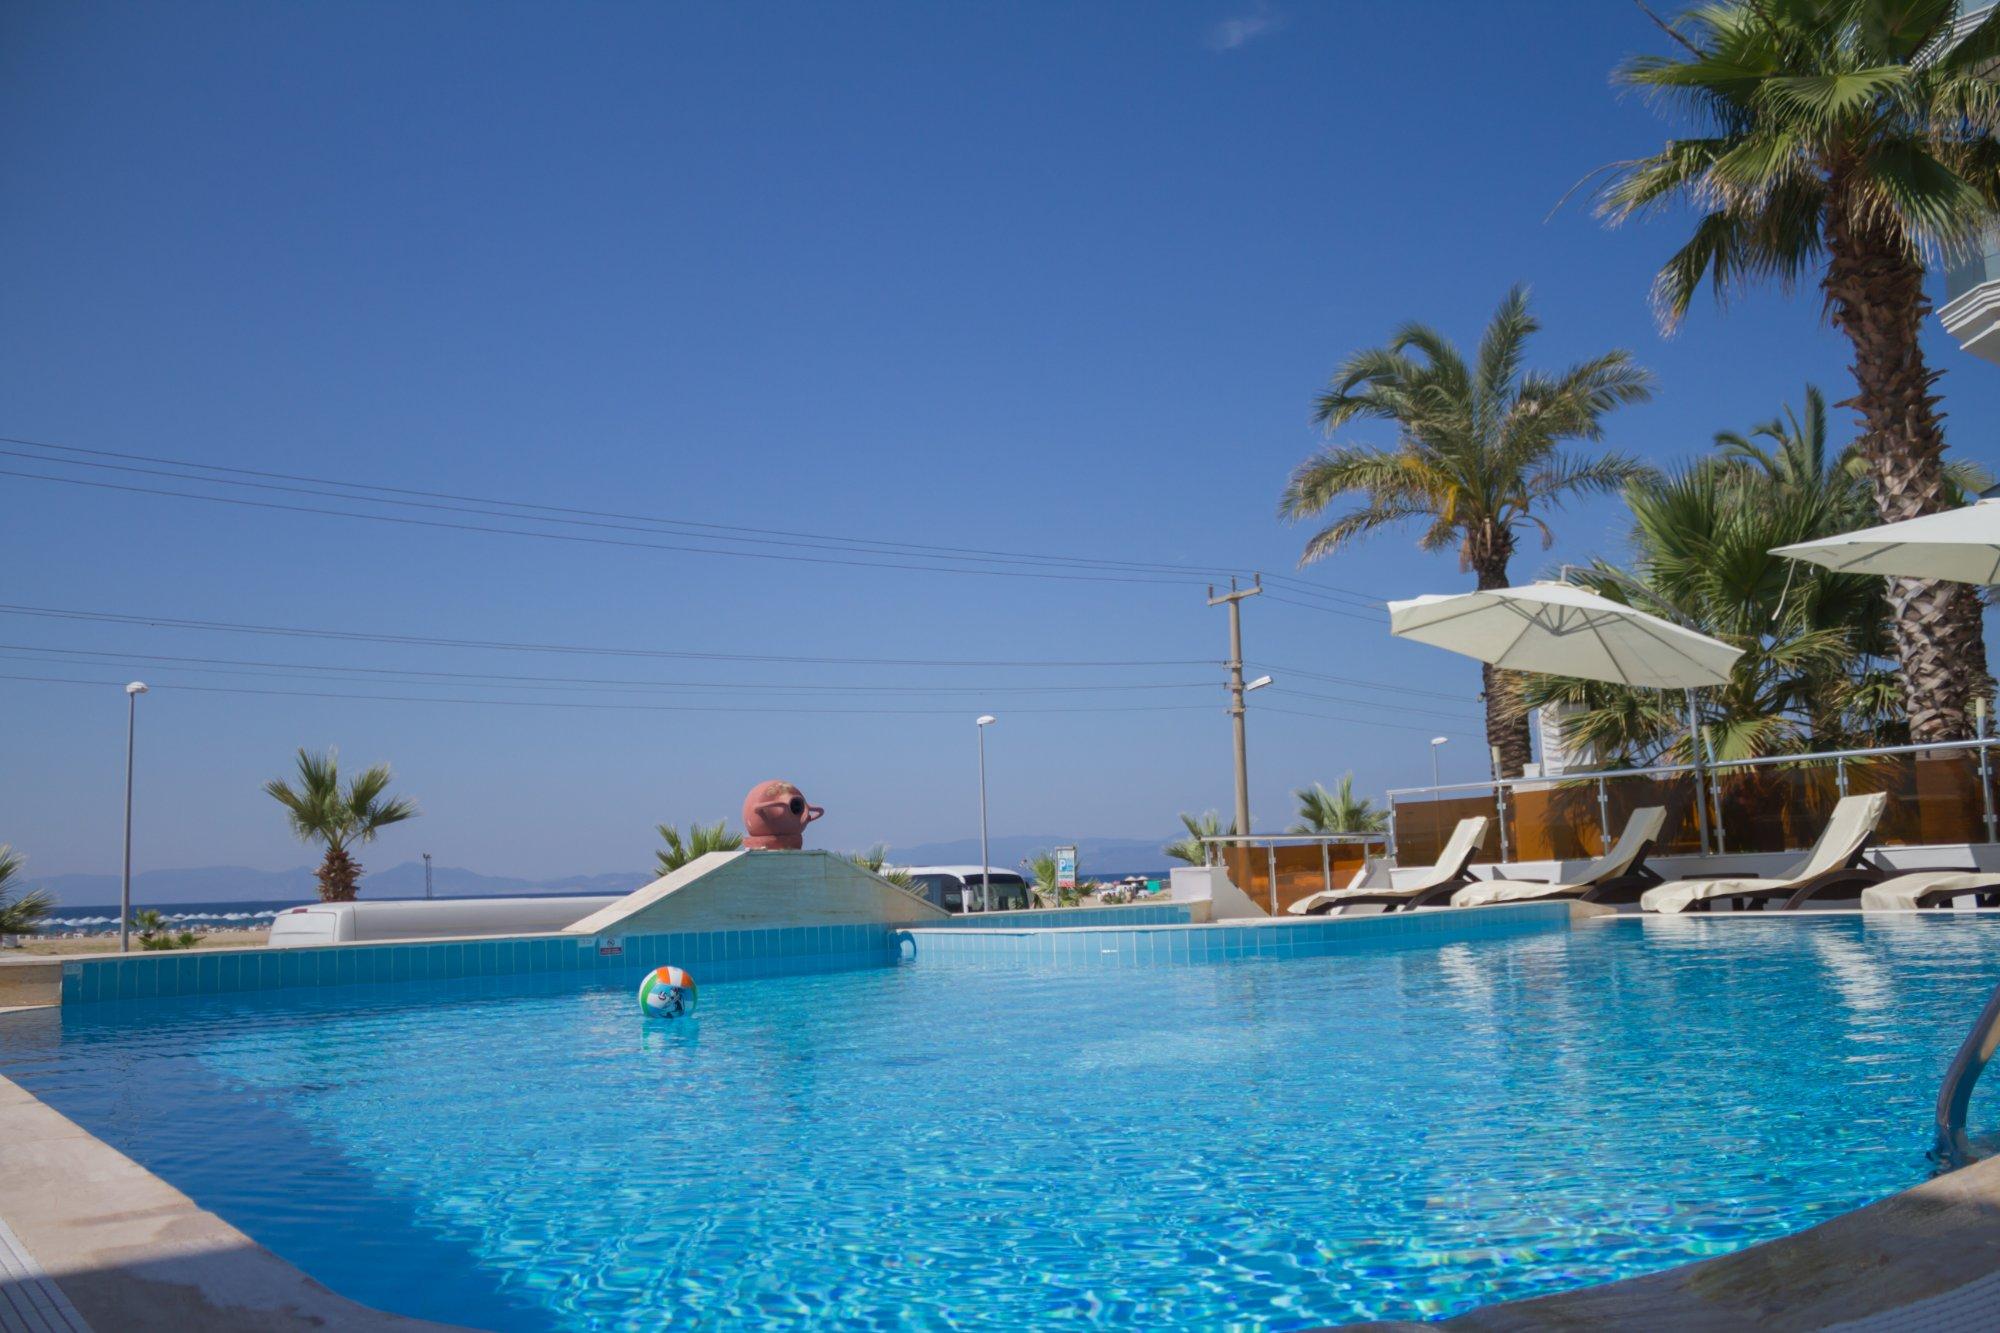 Hotel Amfora 3* Letovanje Turska Sarimsakli